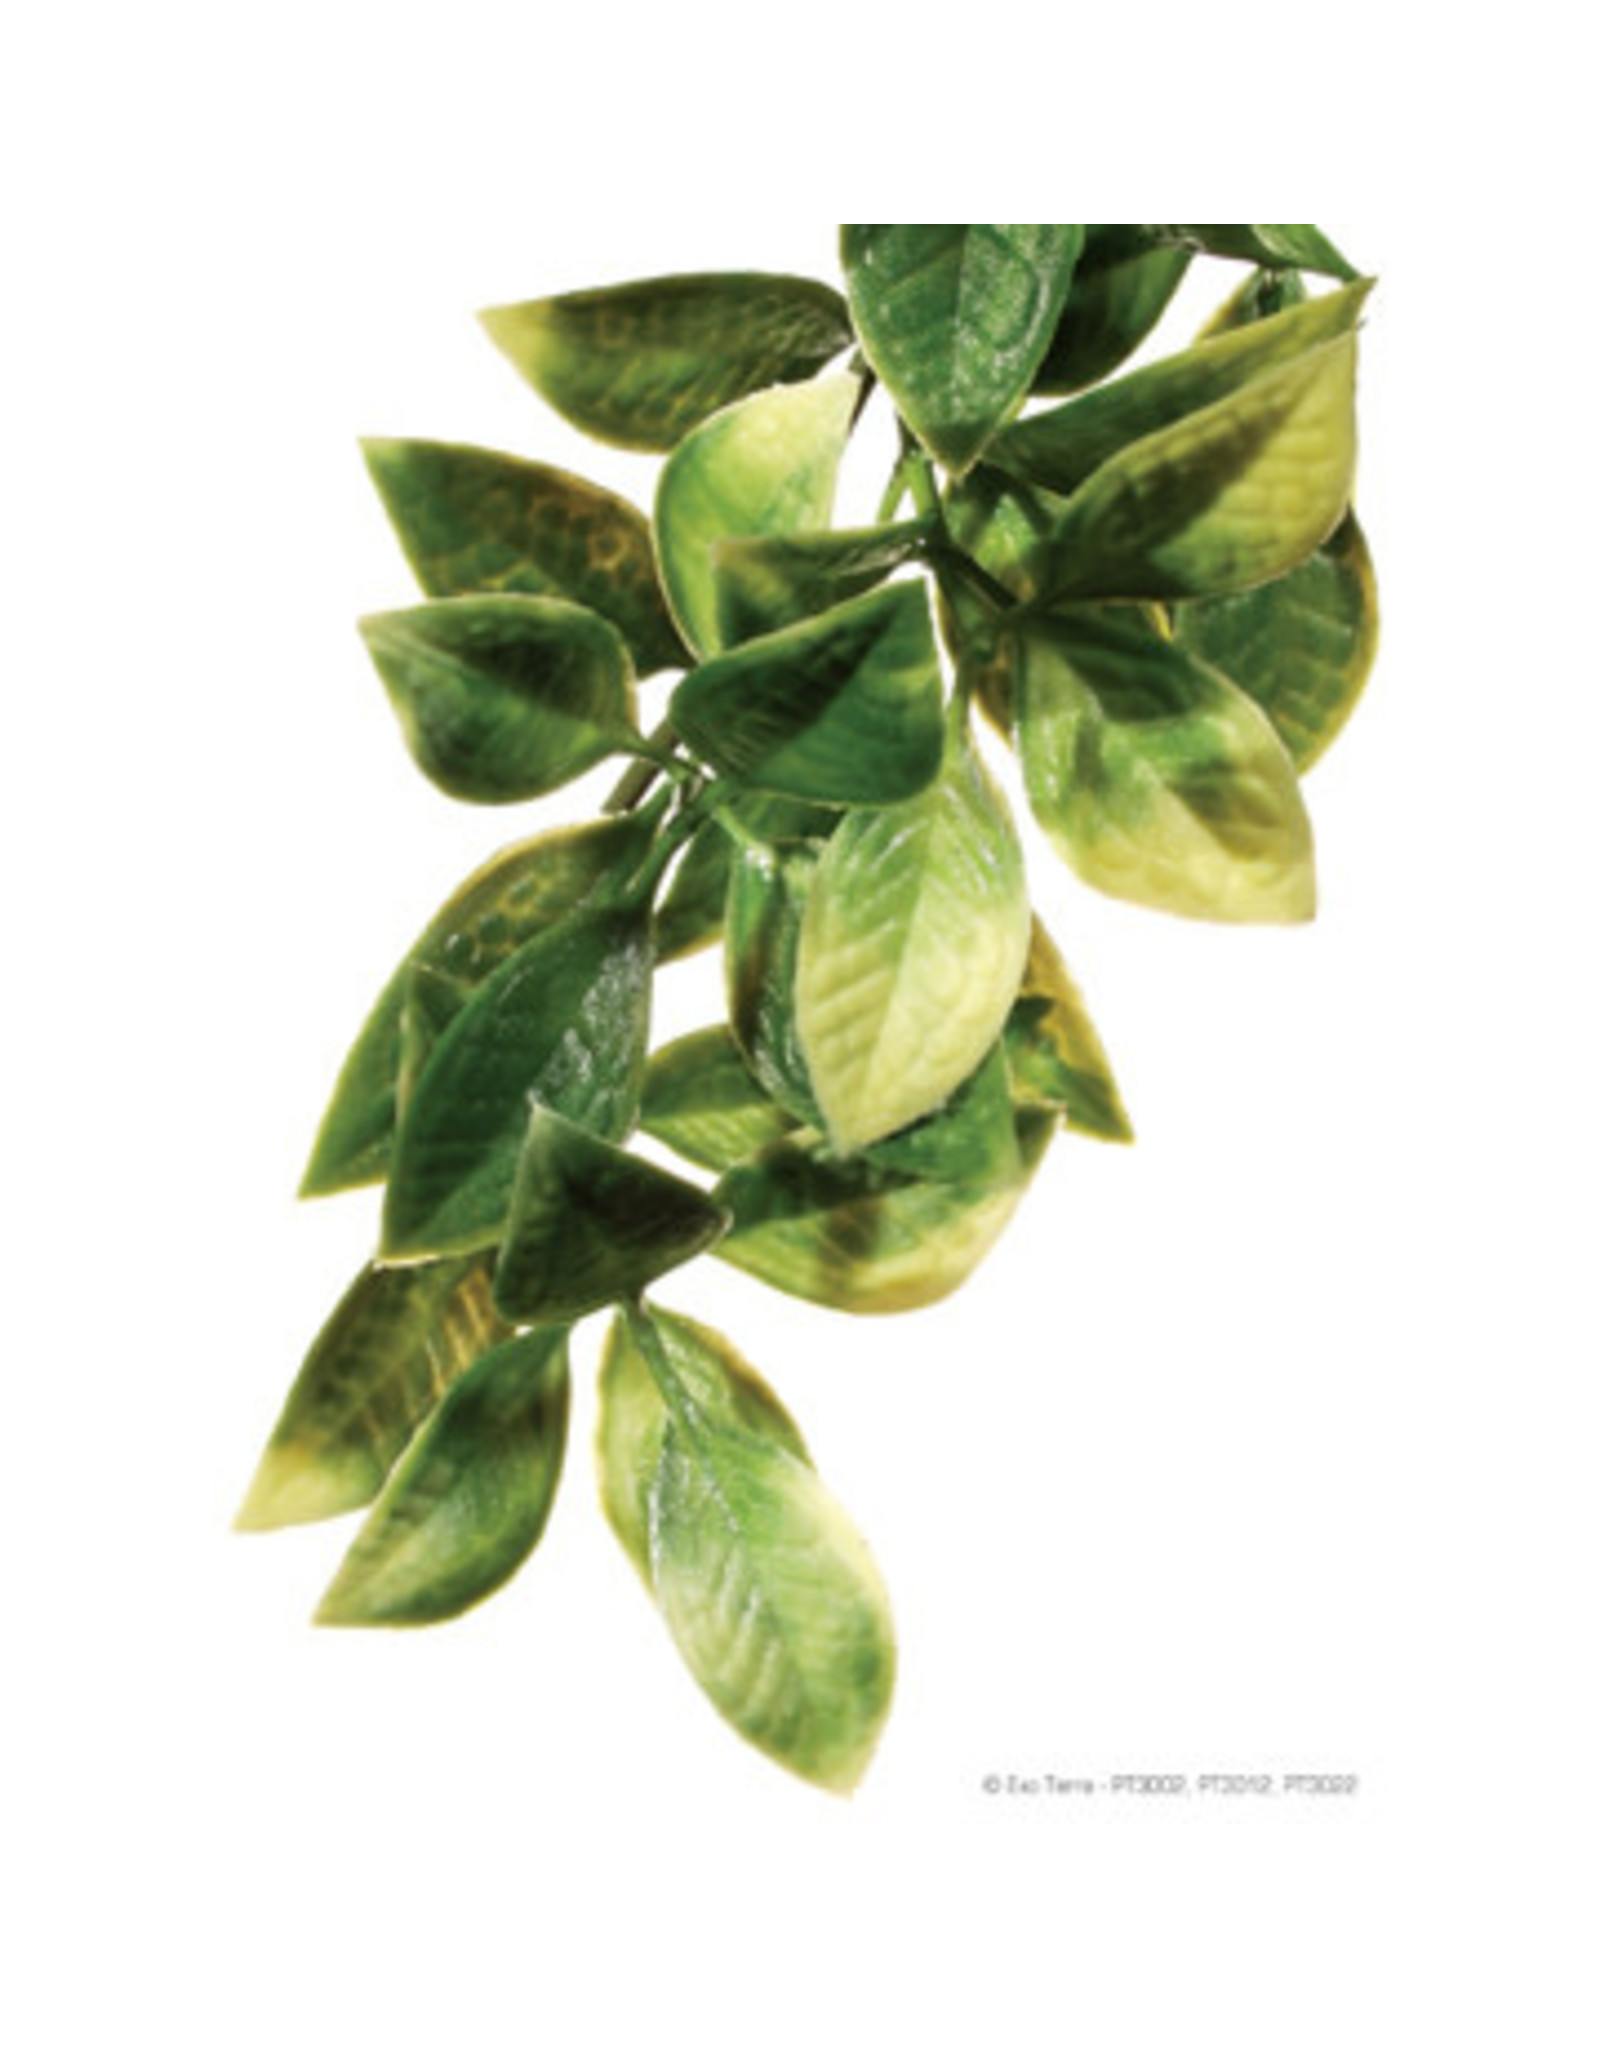 Exo Terra Jungle Plant Mandarin Large